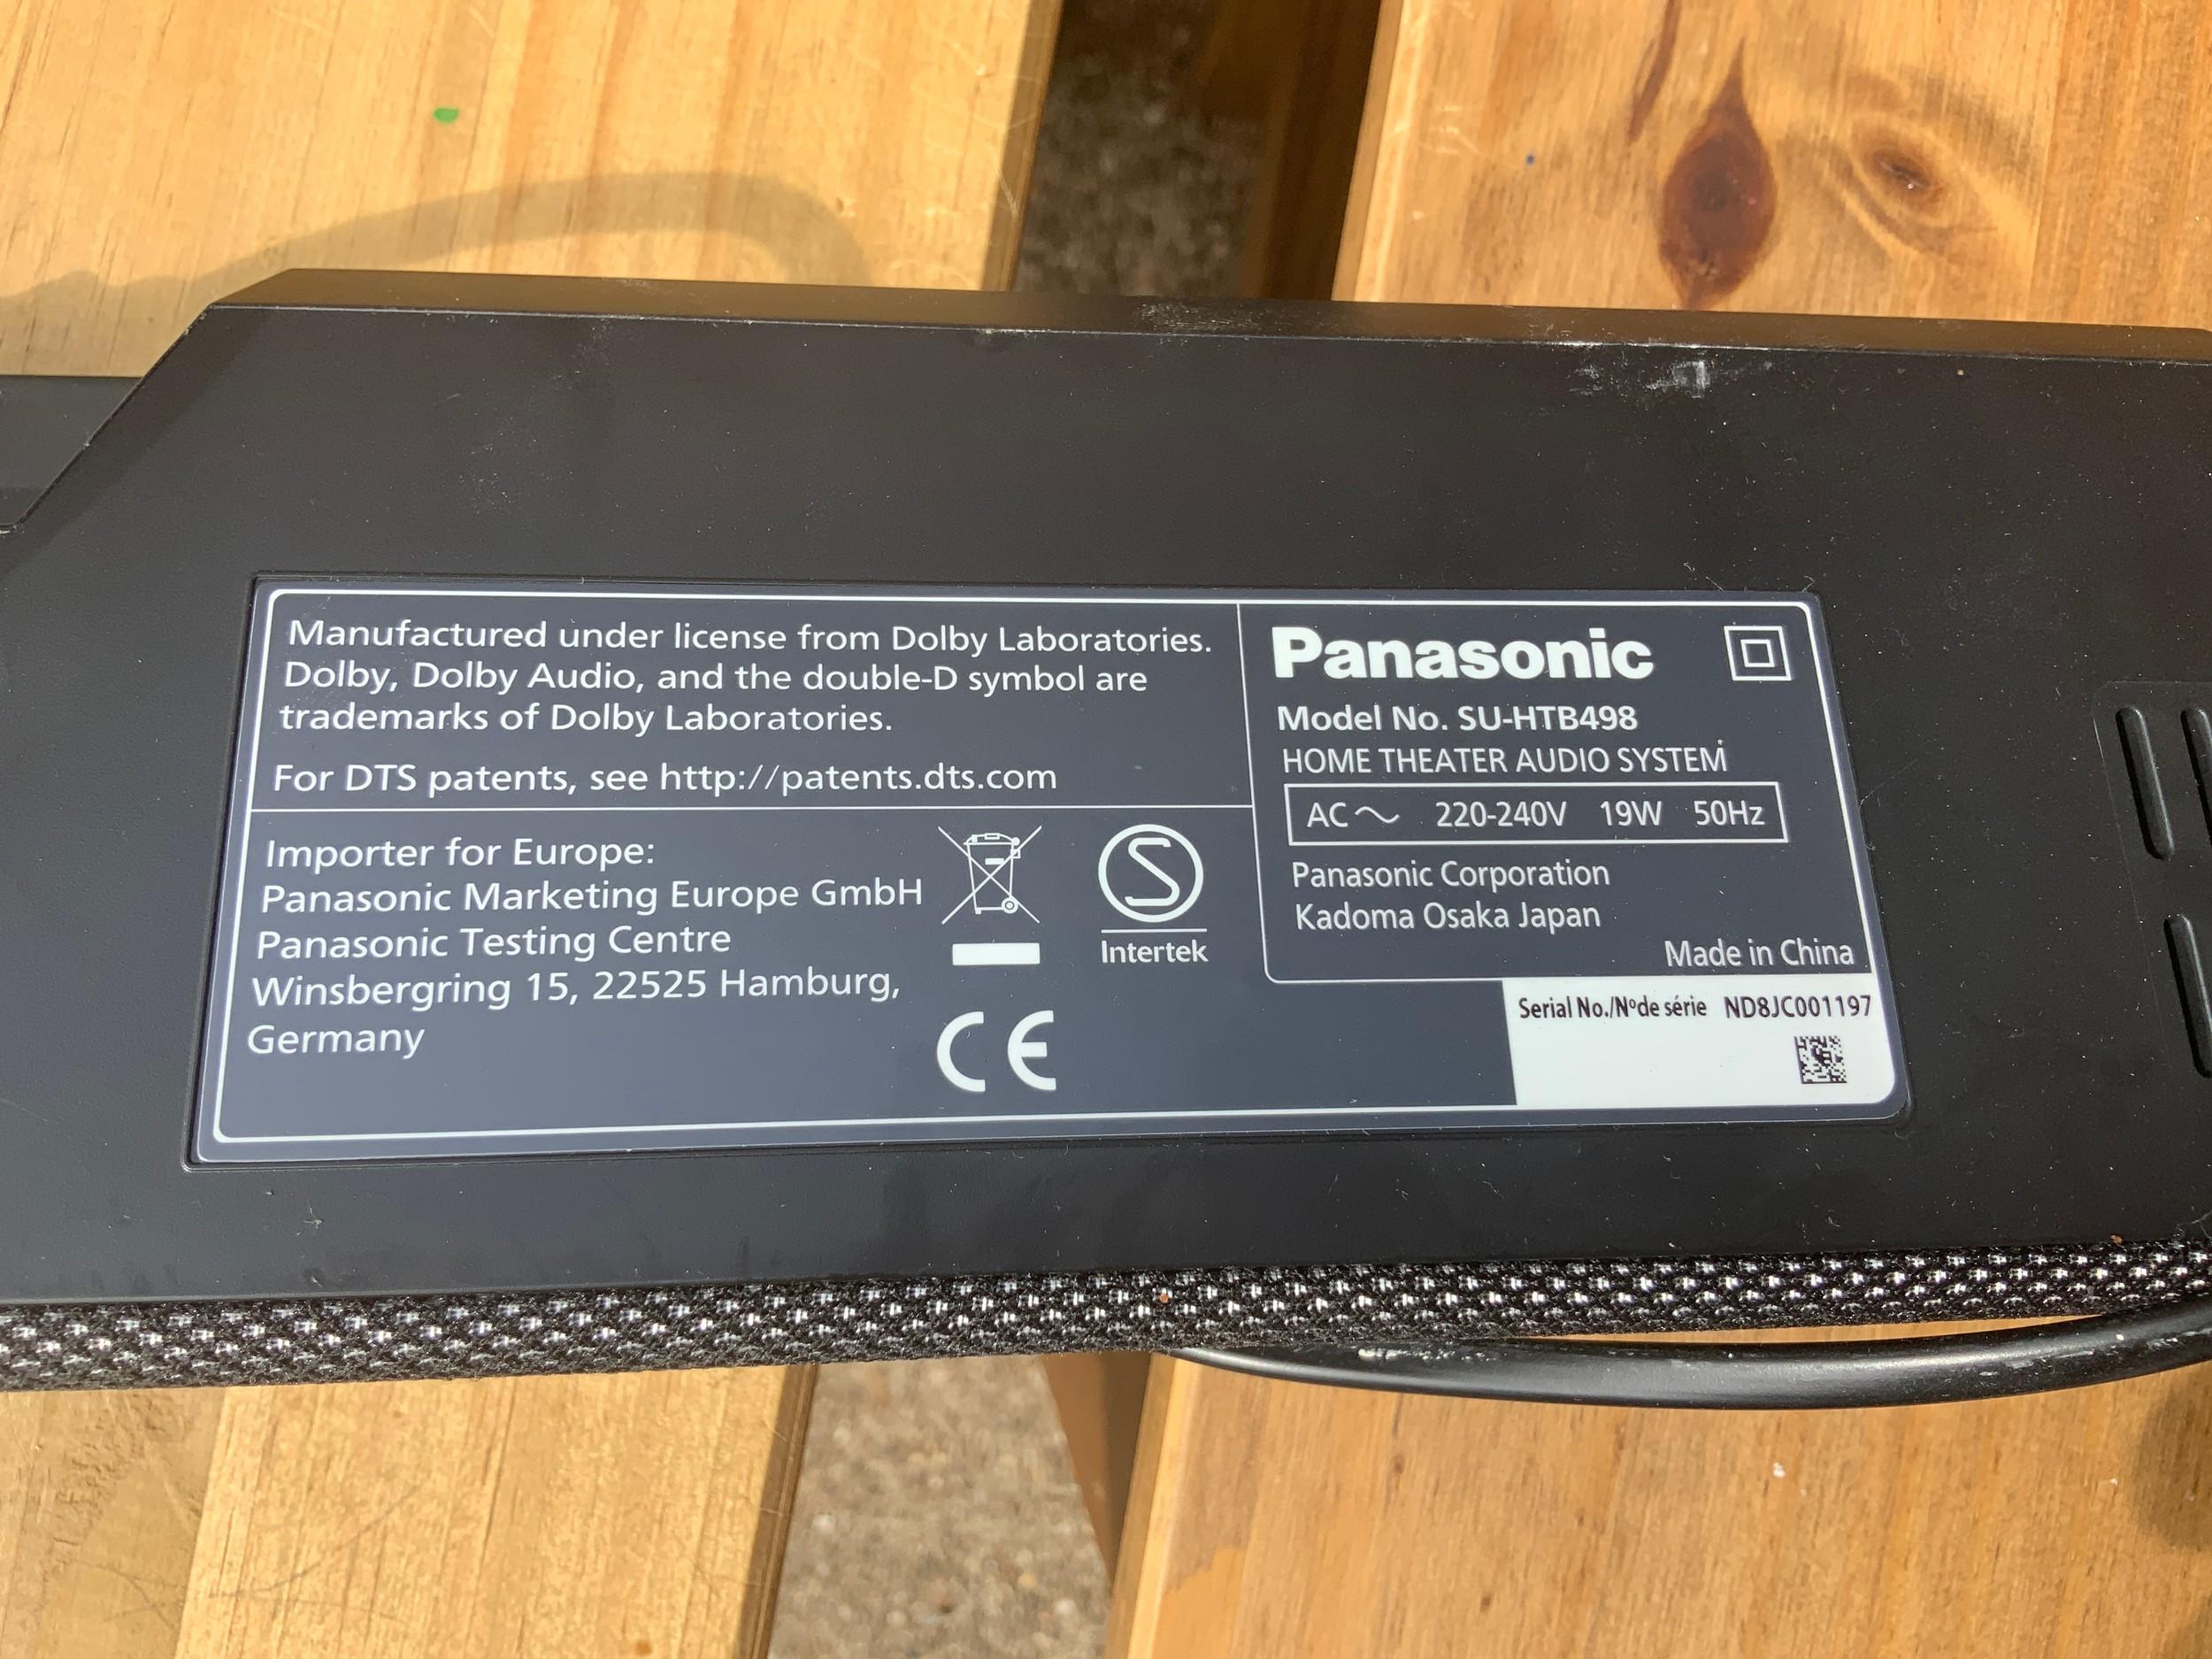 Panasonic Sound Bar and Other - Image 2 of 4